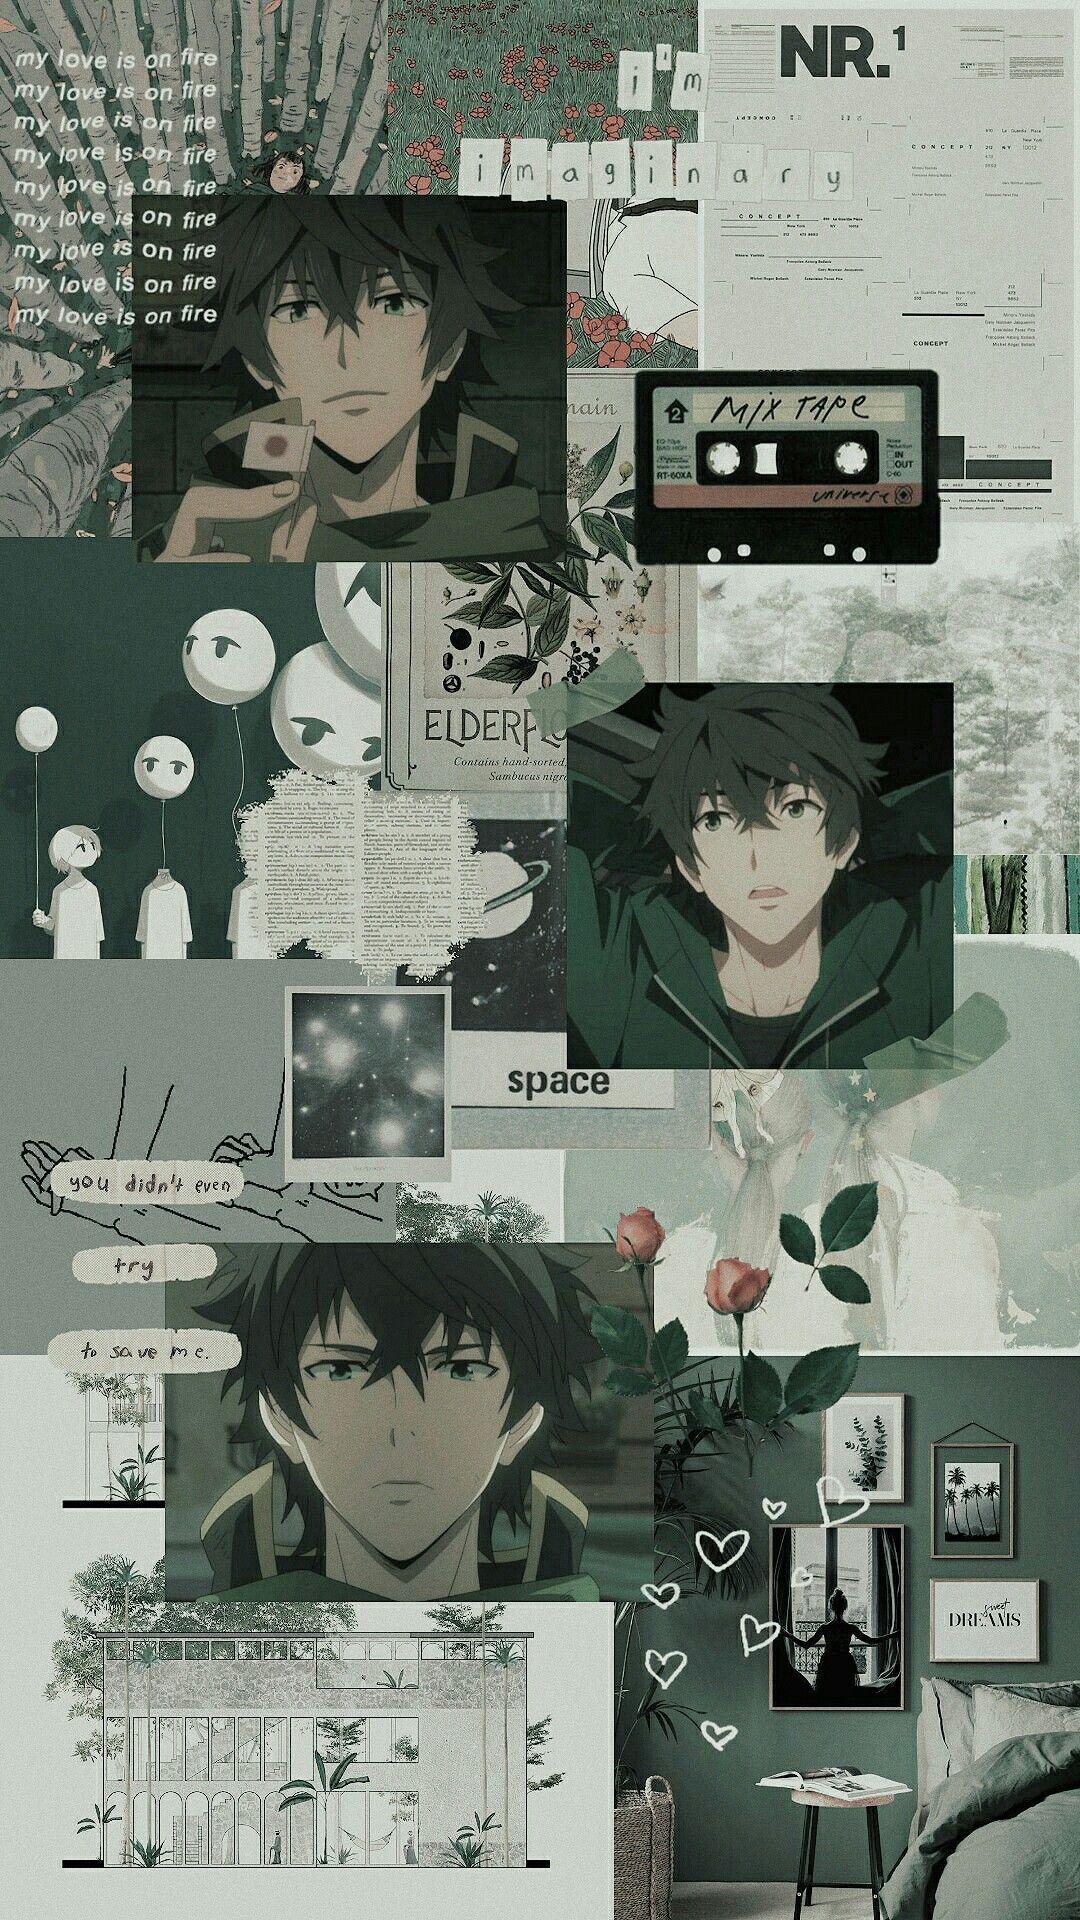 Naofumi Lockscreen Animelockscreen Lockscreen Naofumi Aesthetic Anime Cute Anime Wallpaper Anime